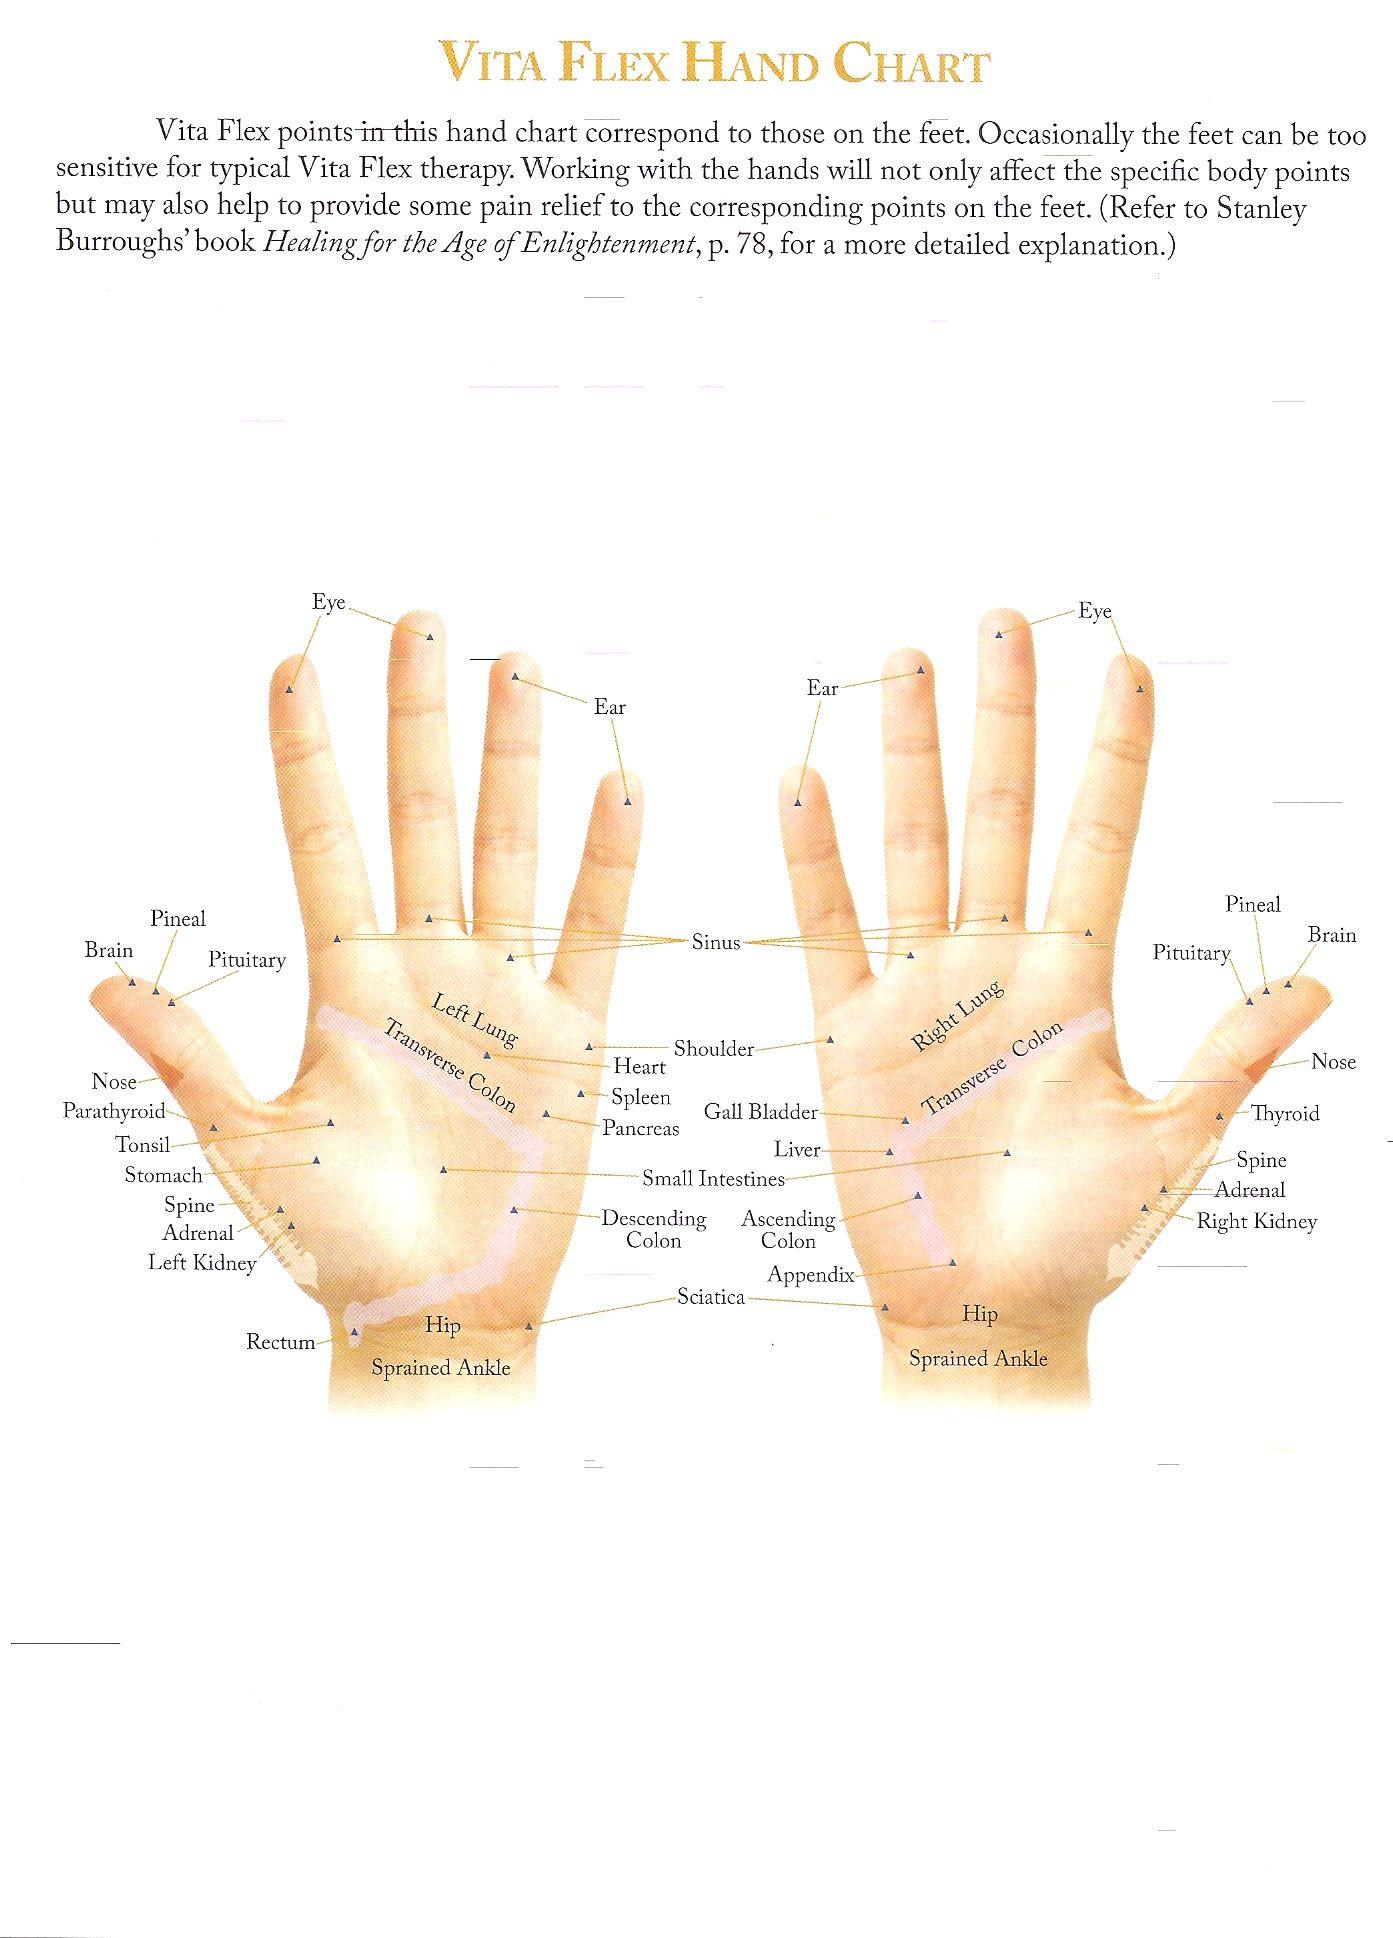 Vita flex hand chart young living essential oils essentials also pinterest rh